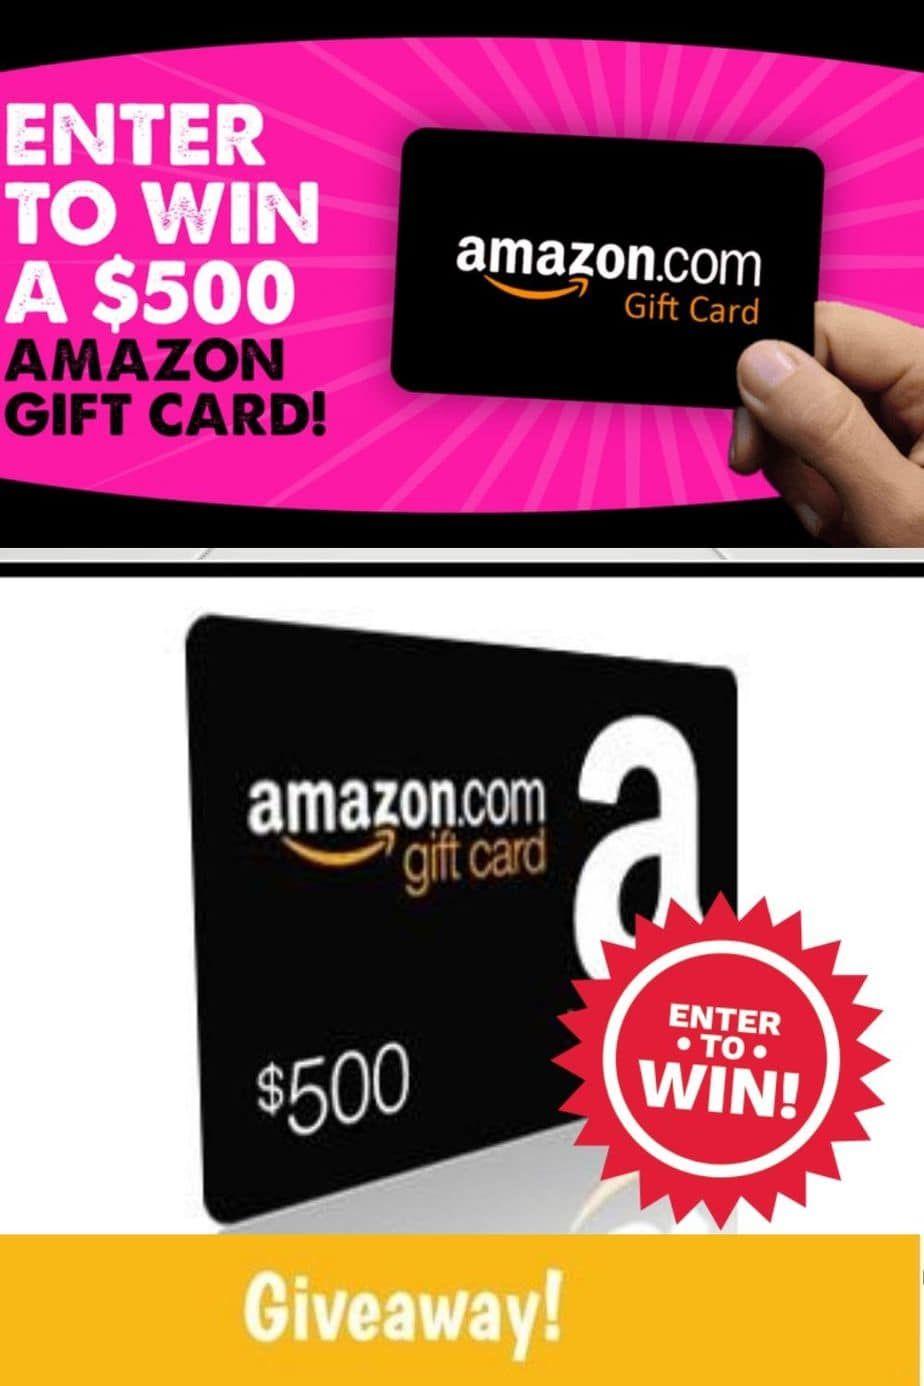 Win Free Amazon Gift Card Amazon Gift Card Free Amazon Gift Cards Amazon Gifts